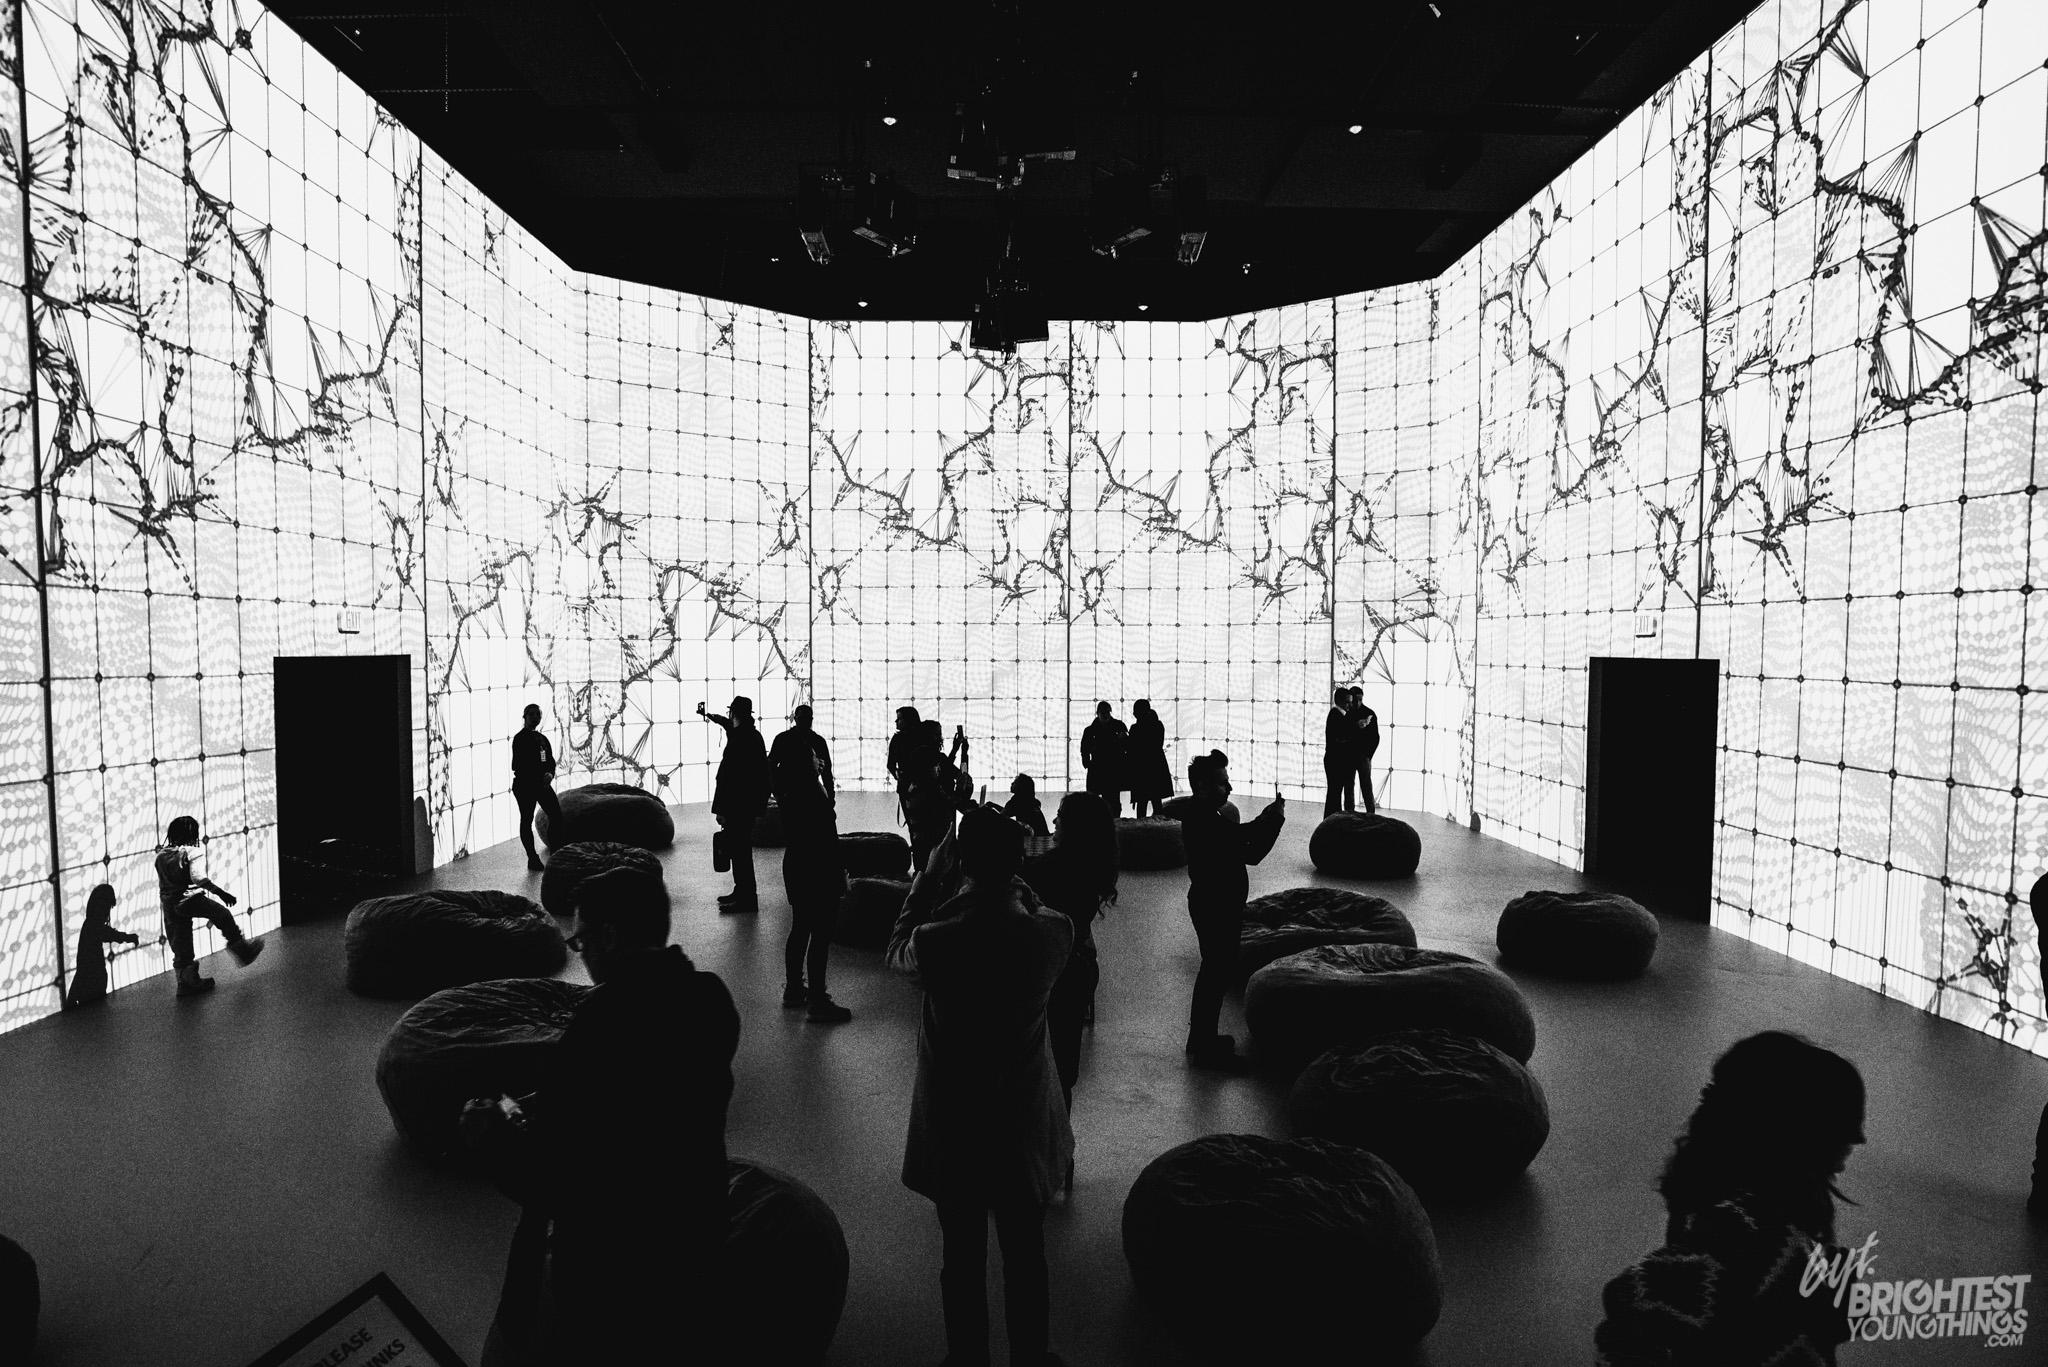 Dont Miss: Machine Hallucination - A New Multimedia